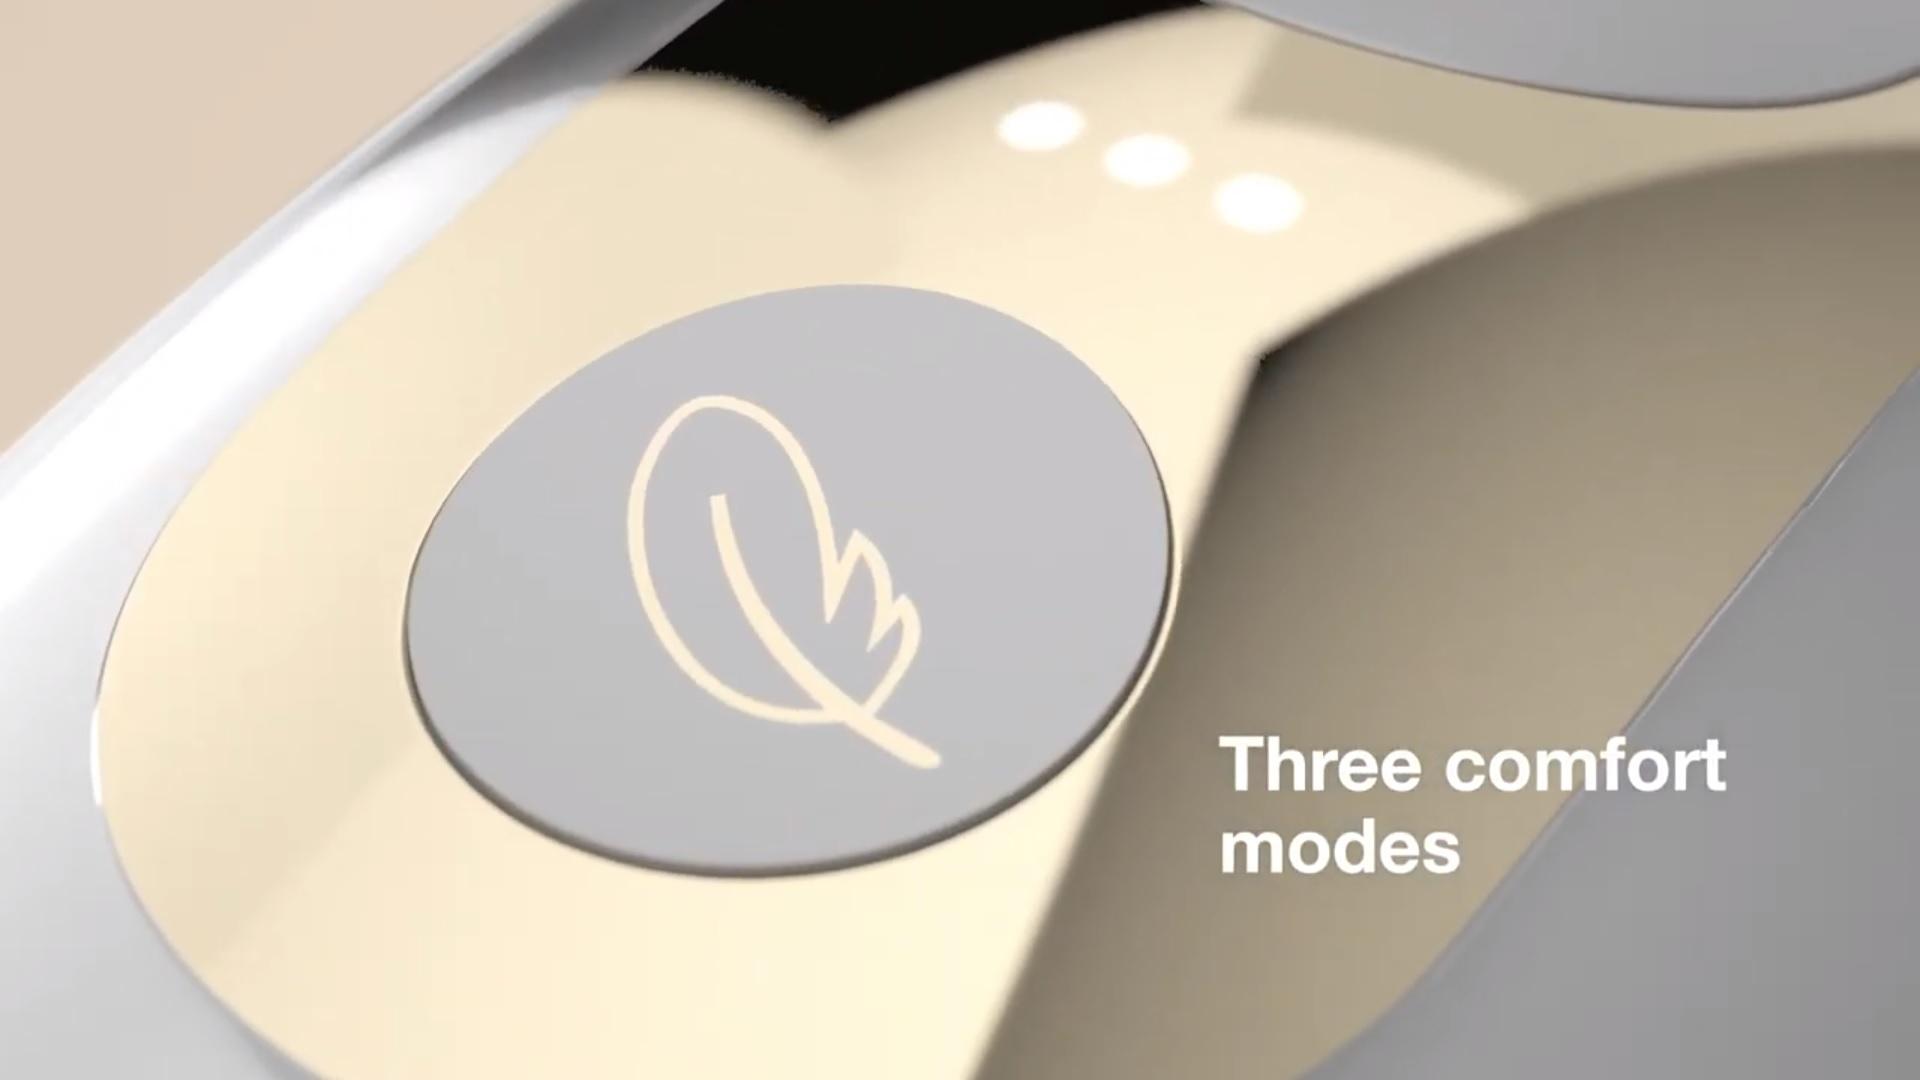 Braun Silk-expert Pro 5 PL5014 IPL 3 režimy